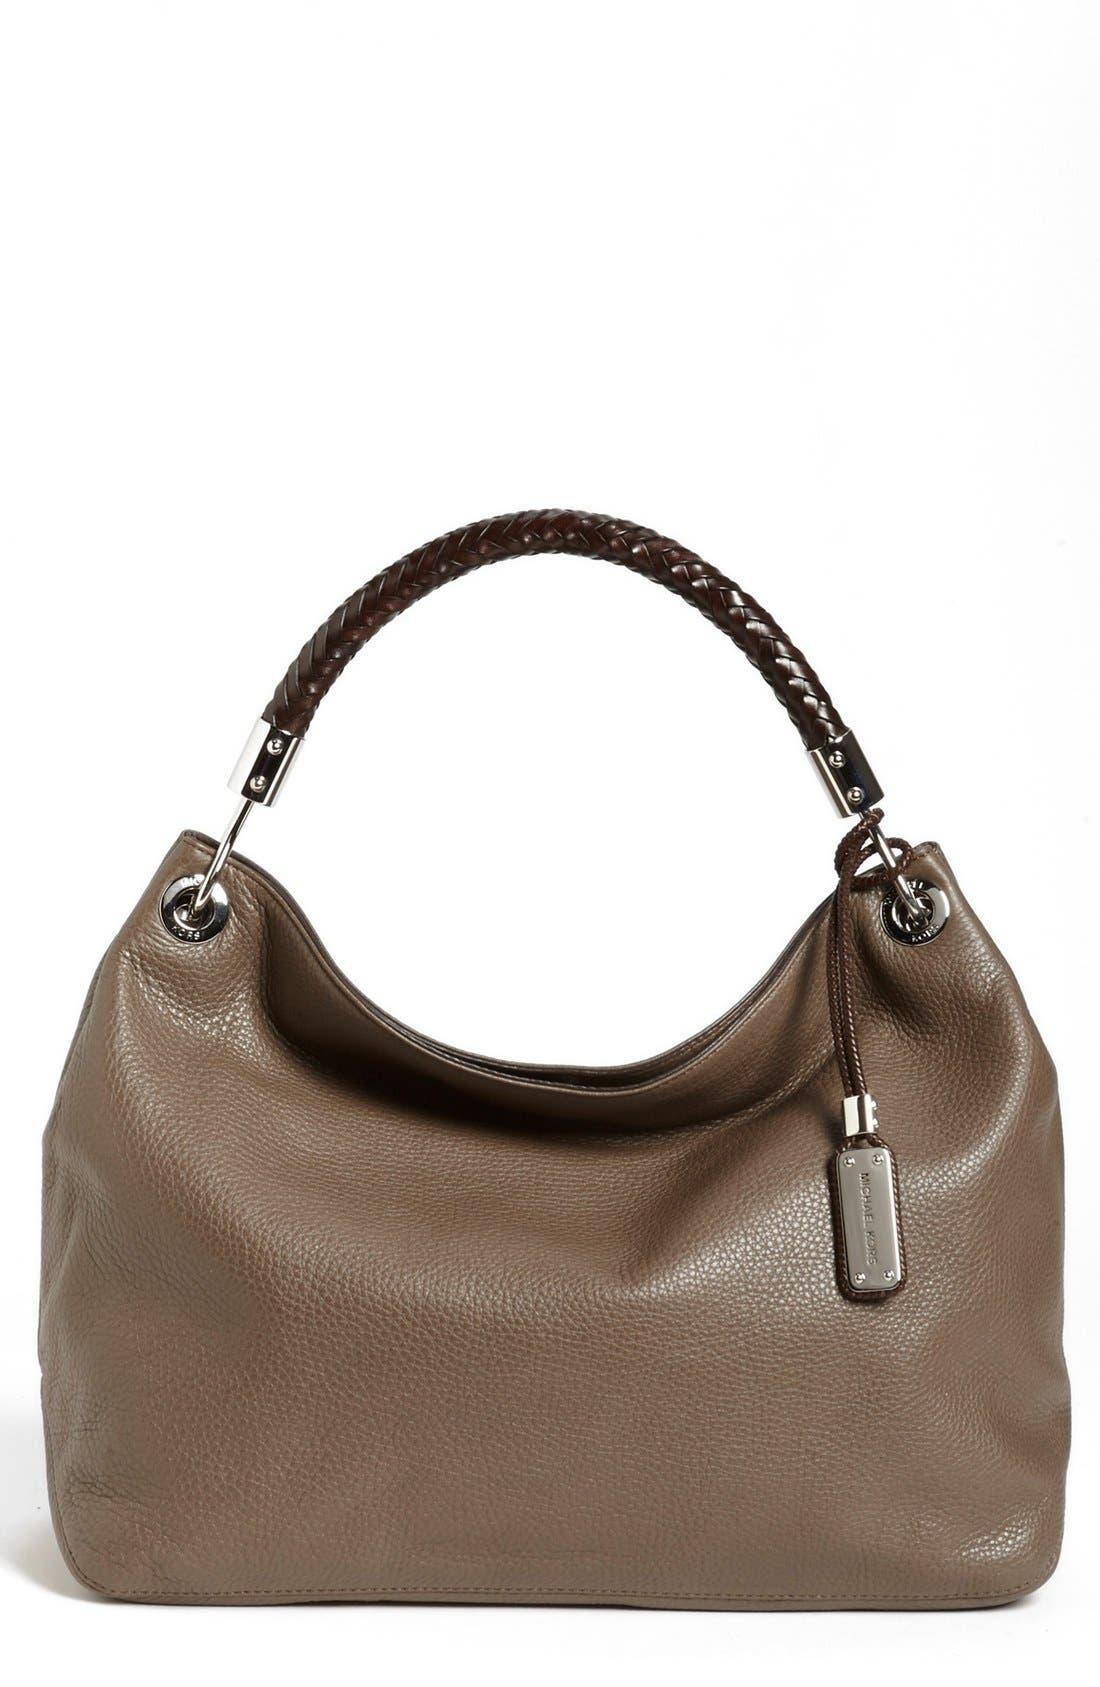 Main Image - Michael Kors 'Large Skorpios' Leather Shoulder Bag